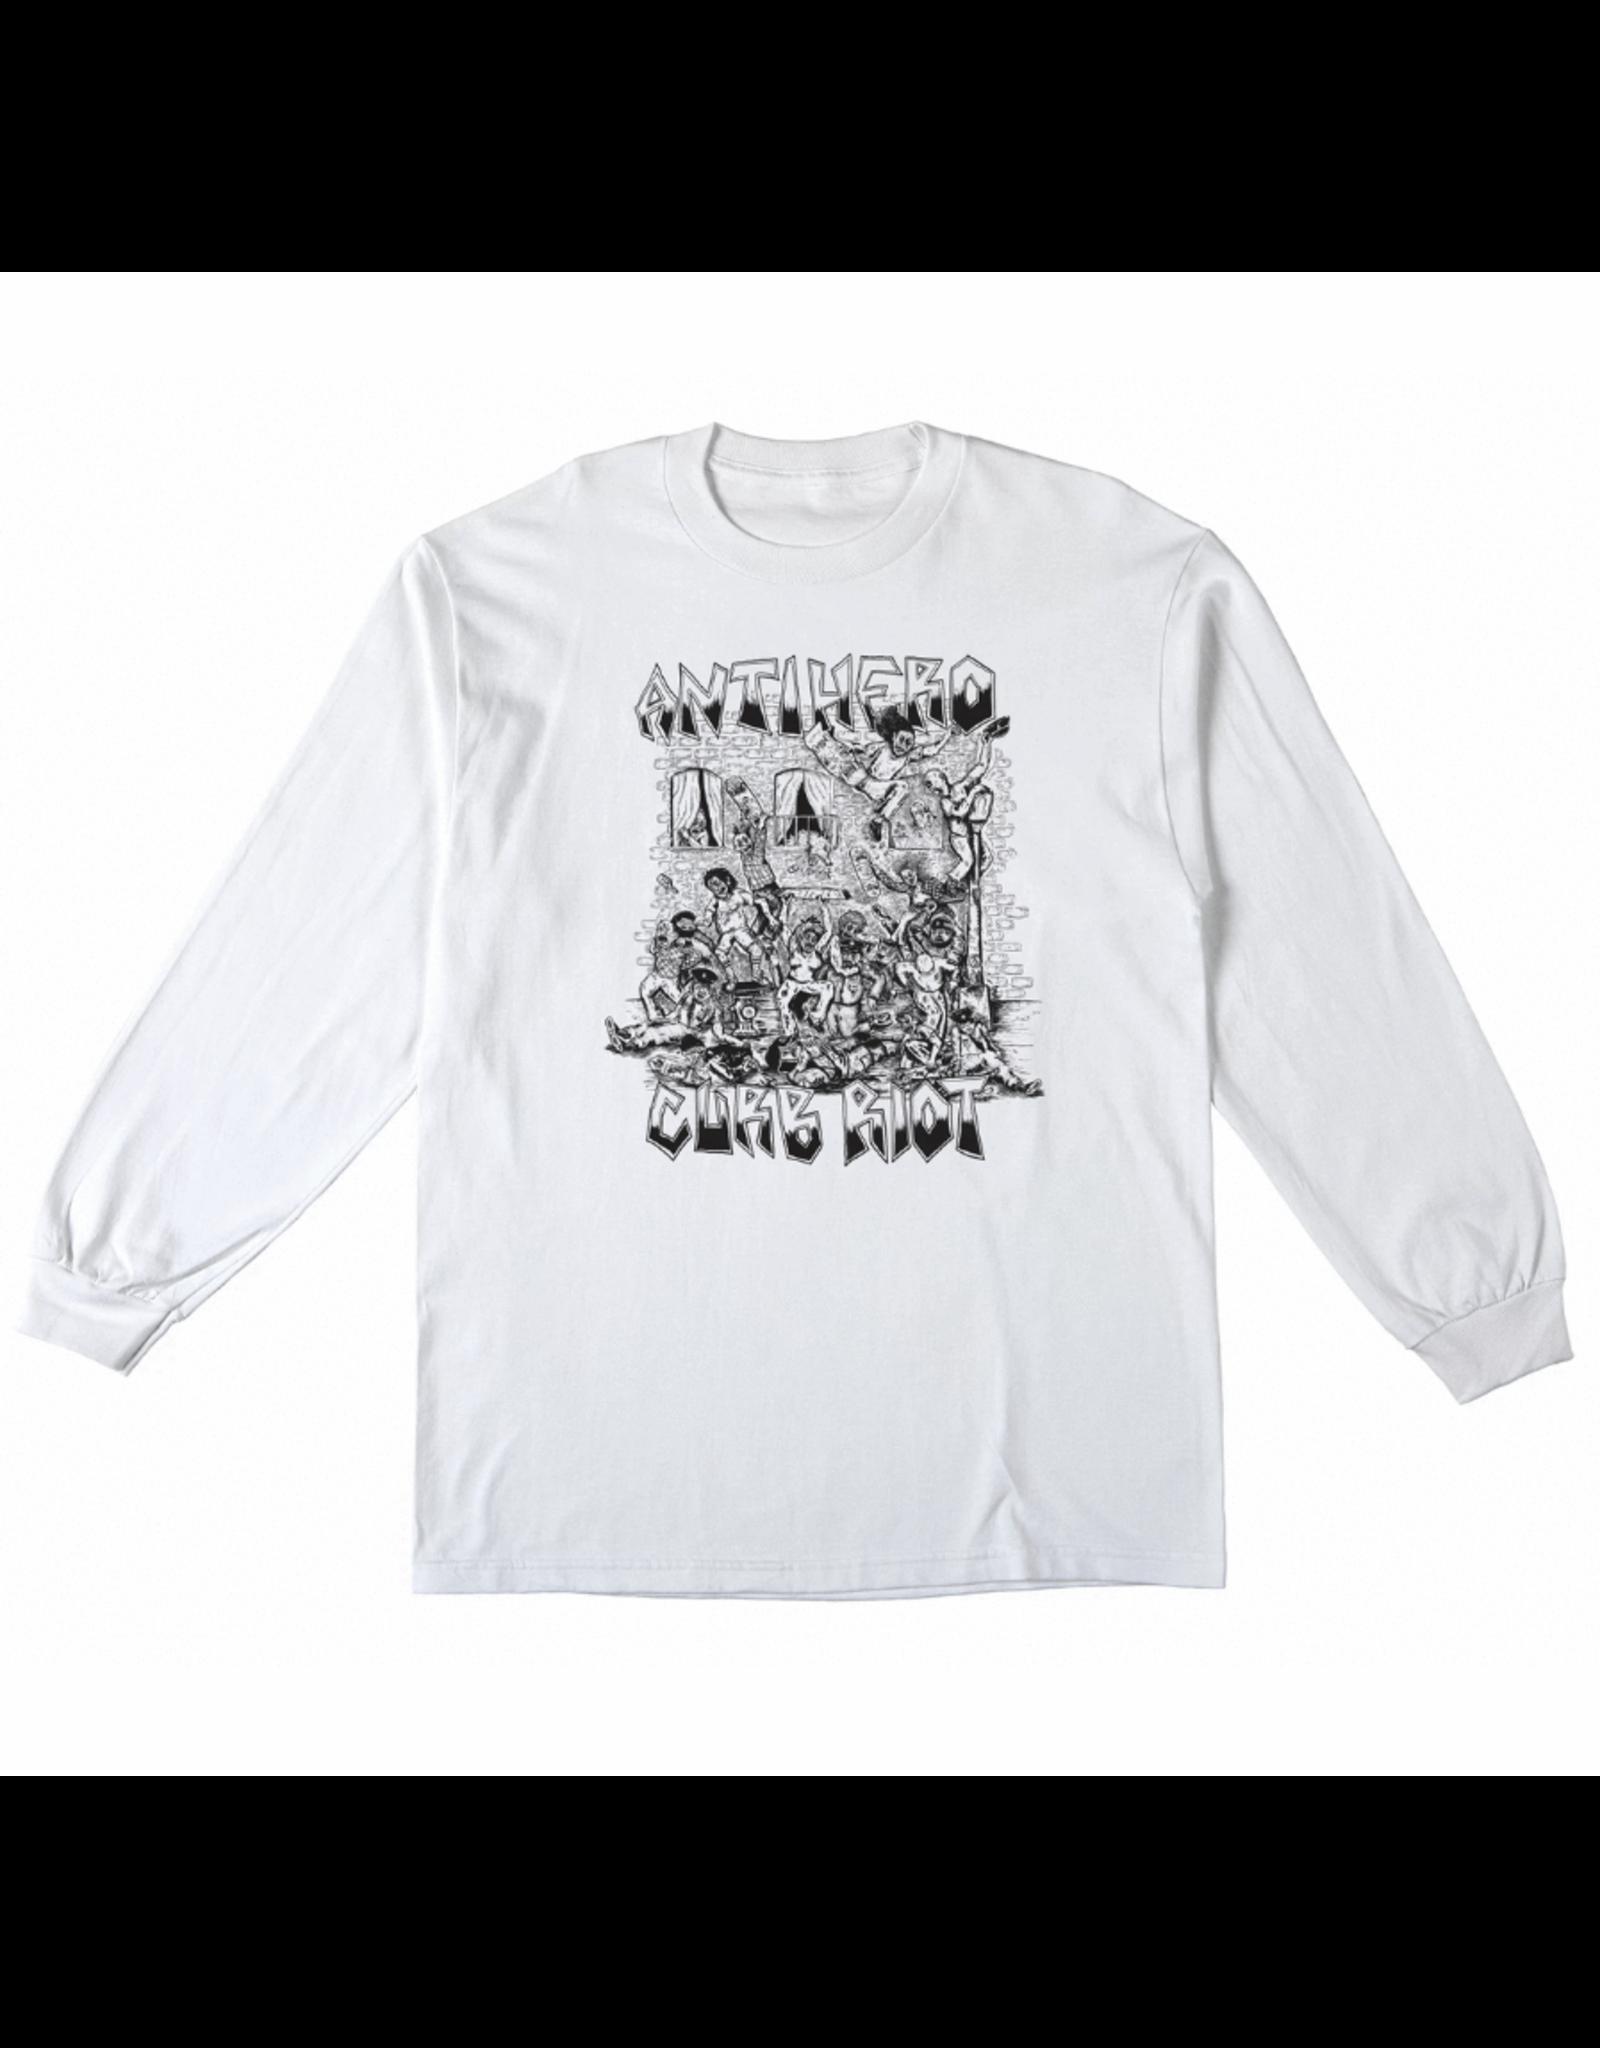 AntiHero Curb Riot Longsleeve - White